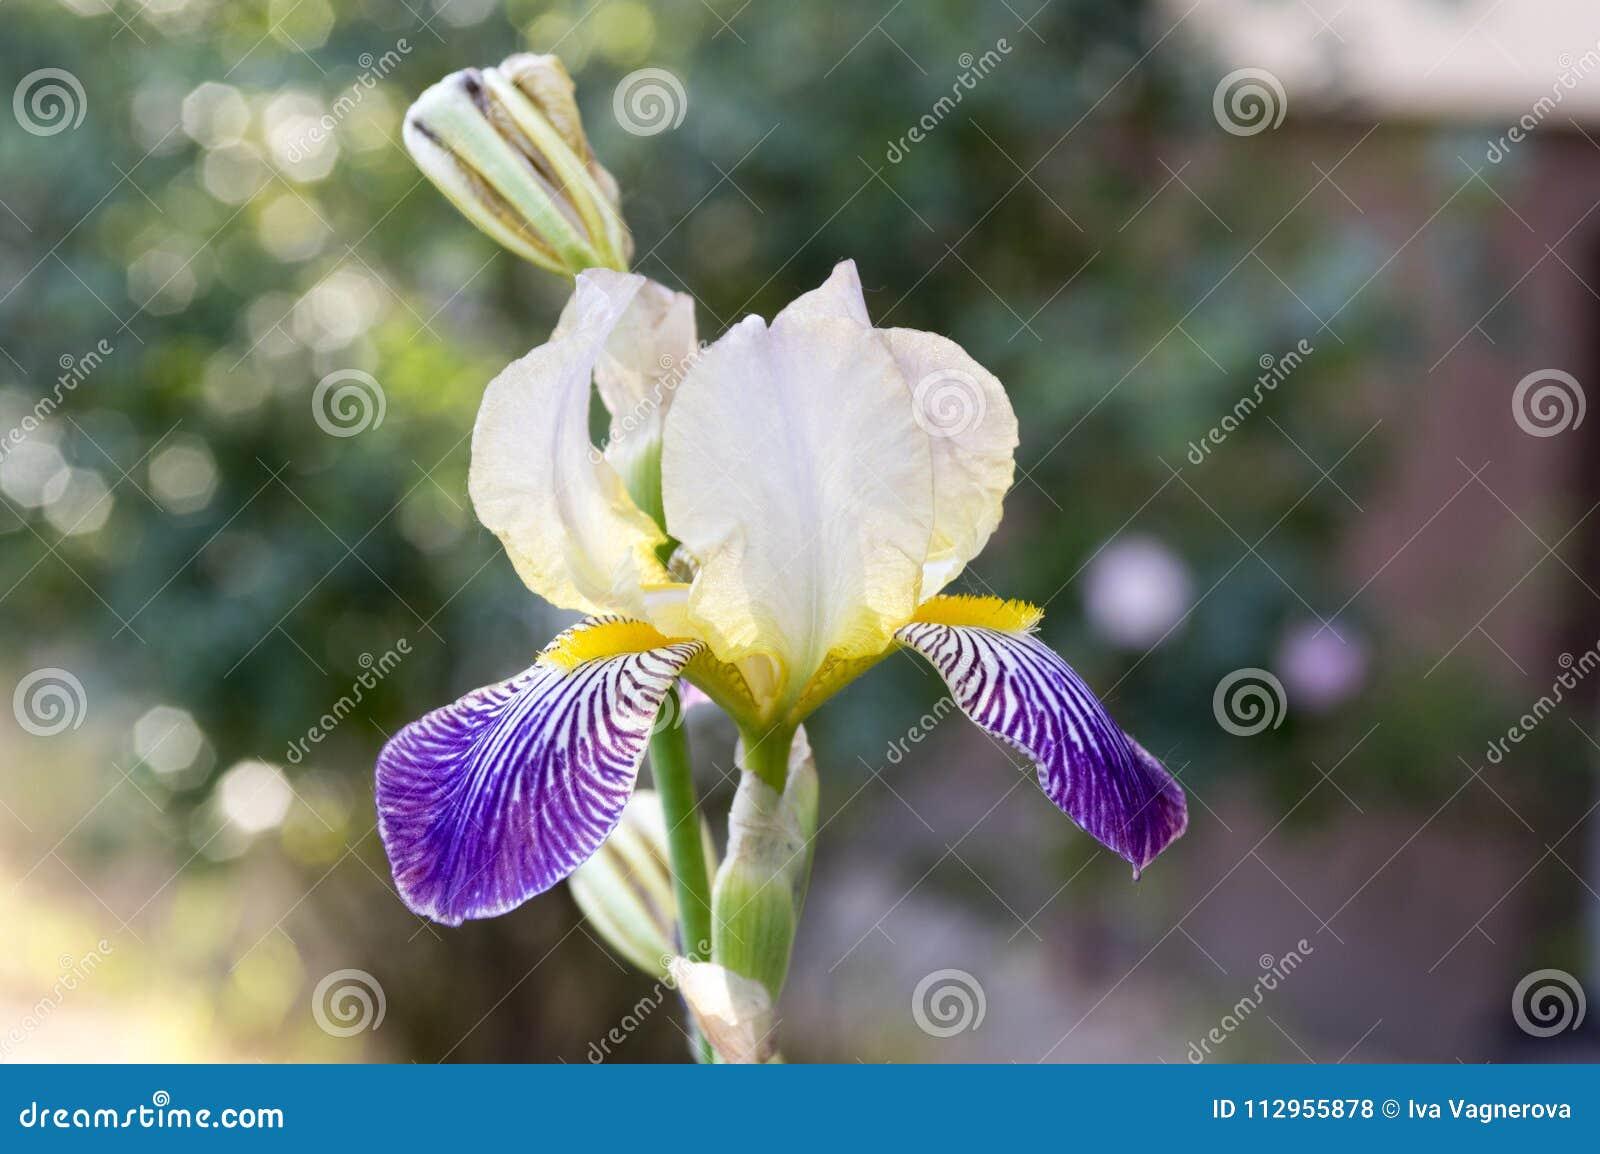 Bearded Iris Flower Iris Germanica In Bloom Stock Photo Image Of